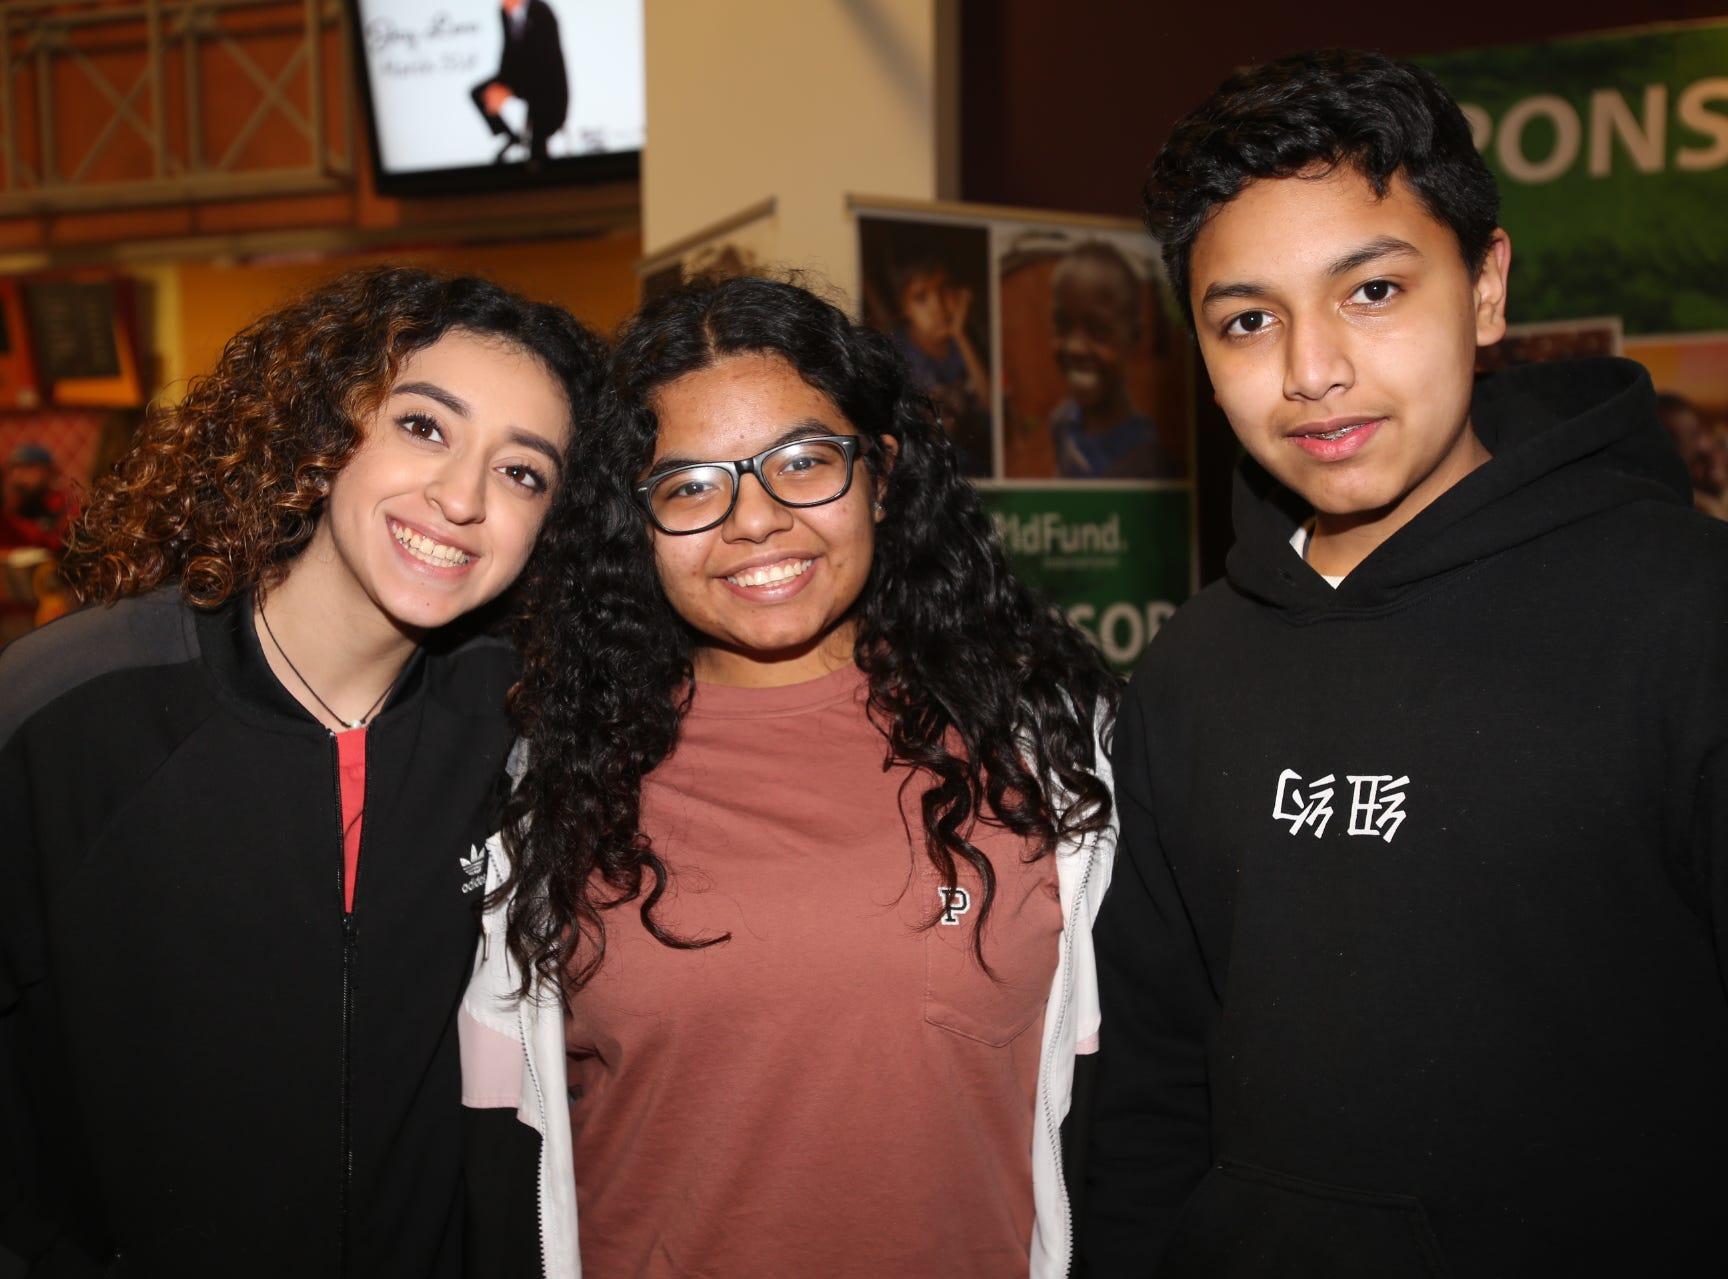 Jennifer Mercado, Yatzary and Louis Perez